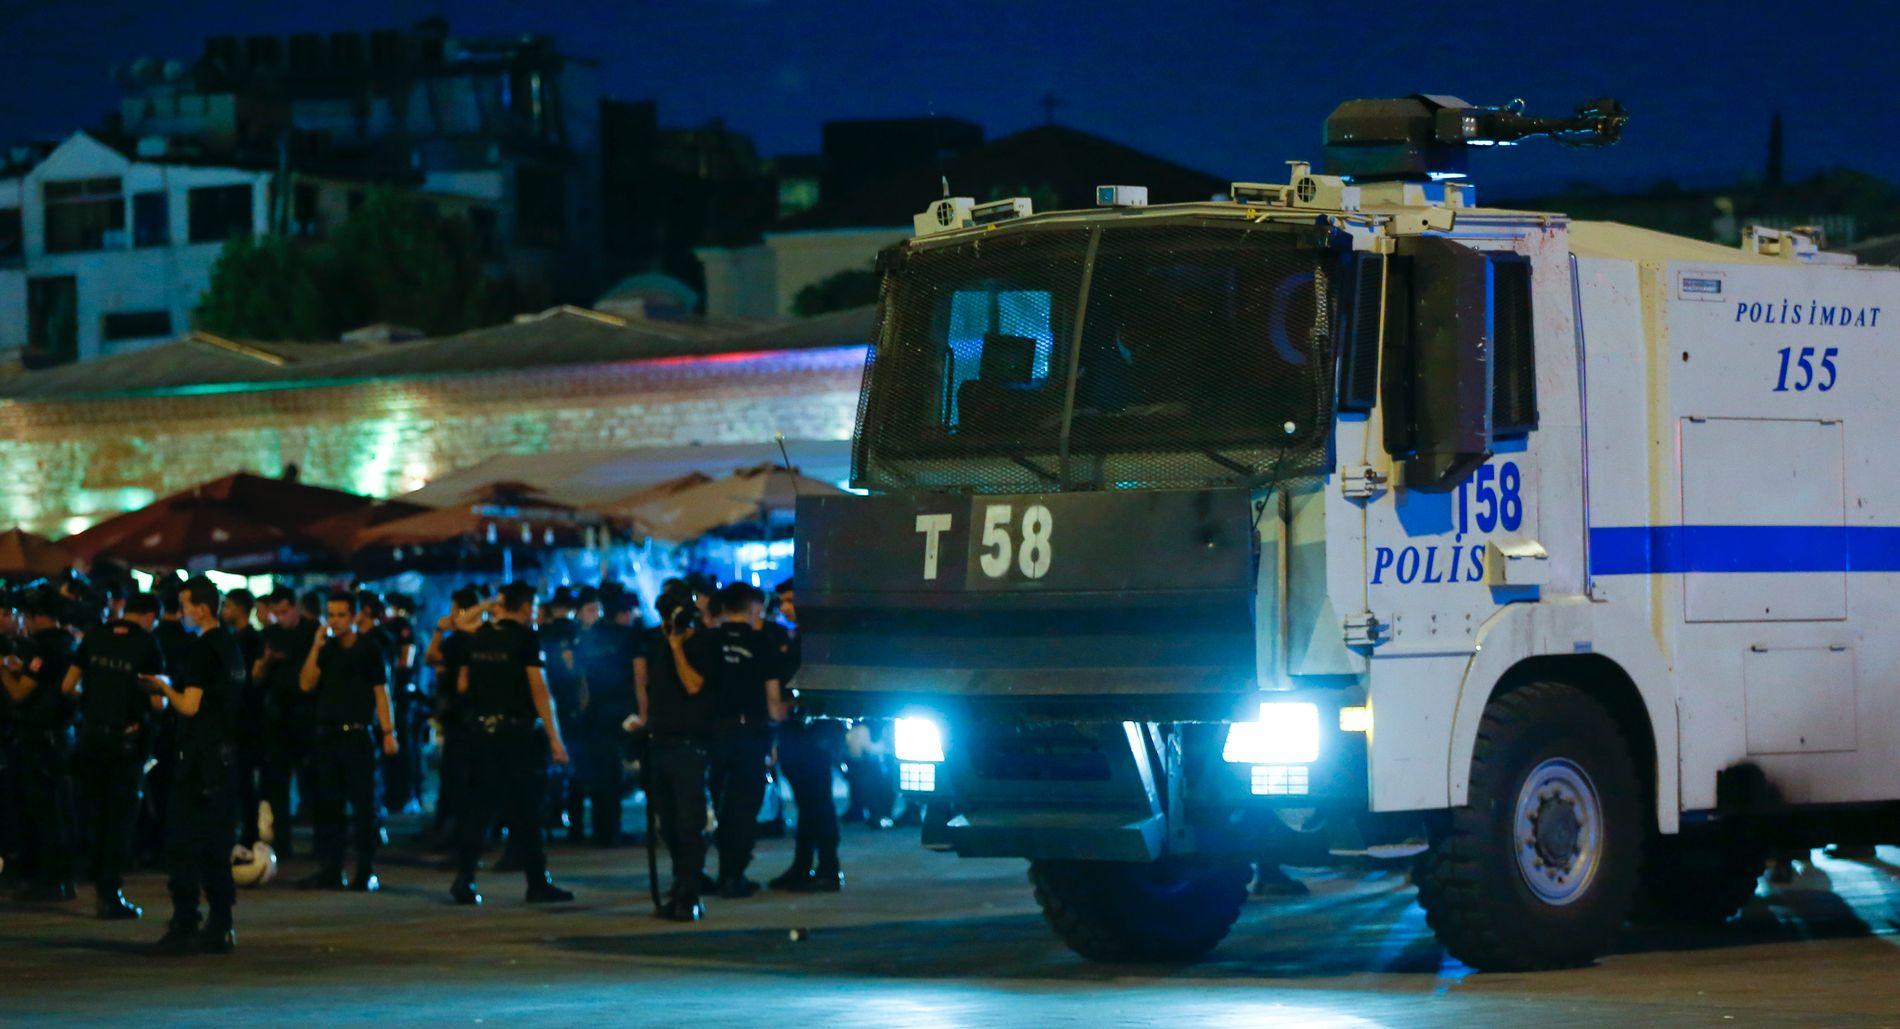 POLITI: Tyrkiske politistyrker nær Taksim-plassen i Istanbul fredag kveld.